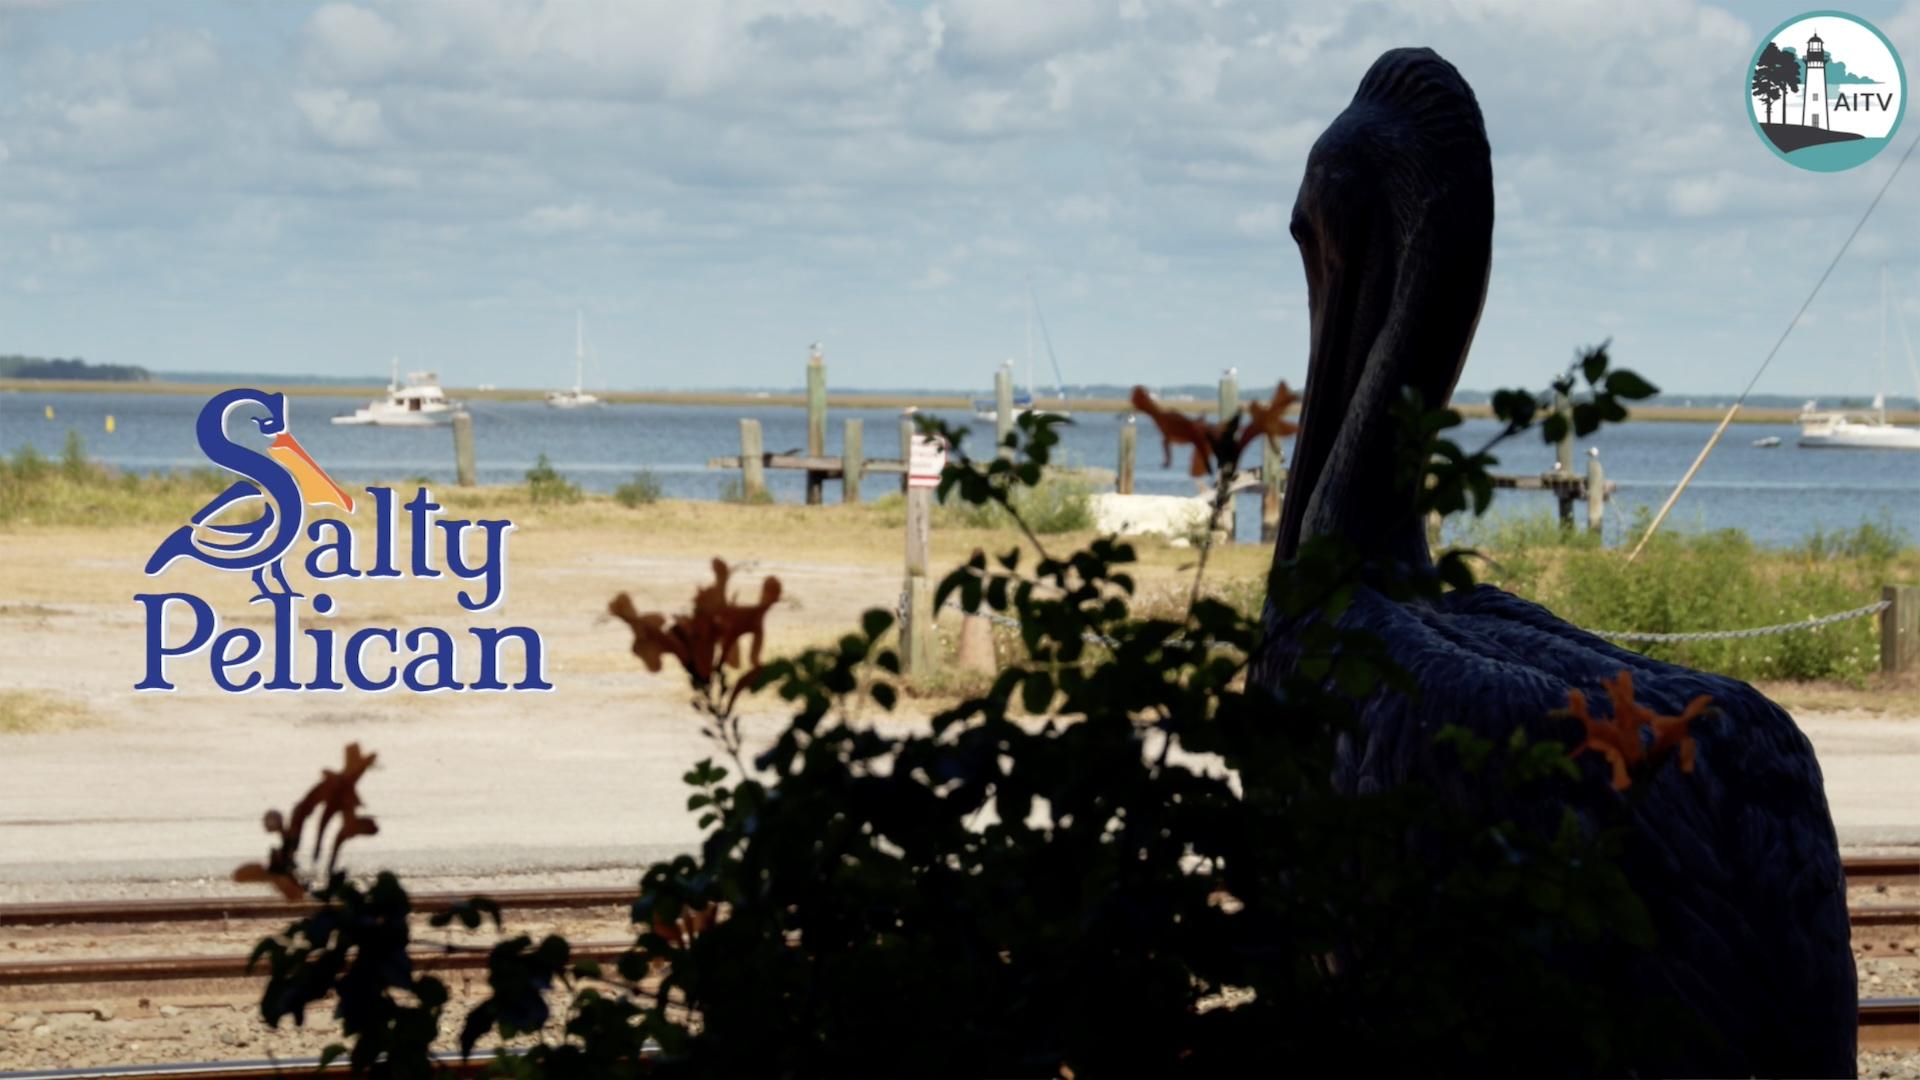 salty pelican thumbnail